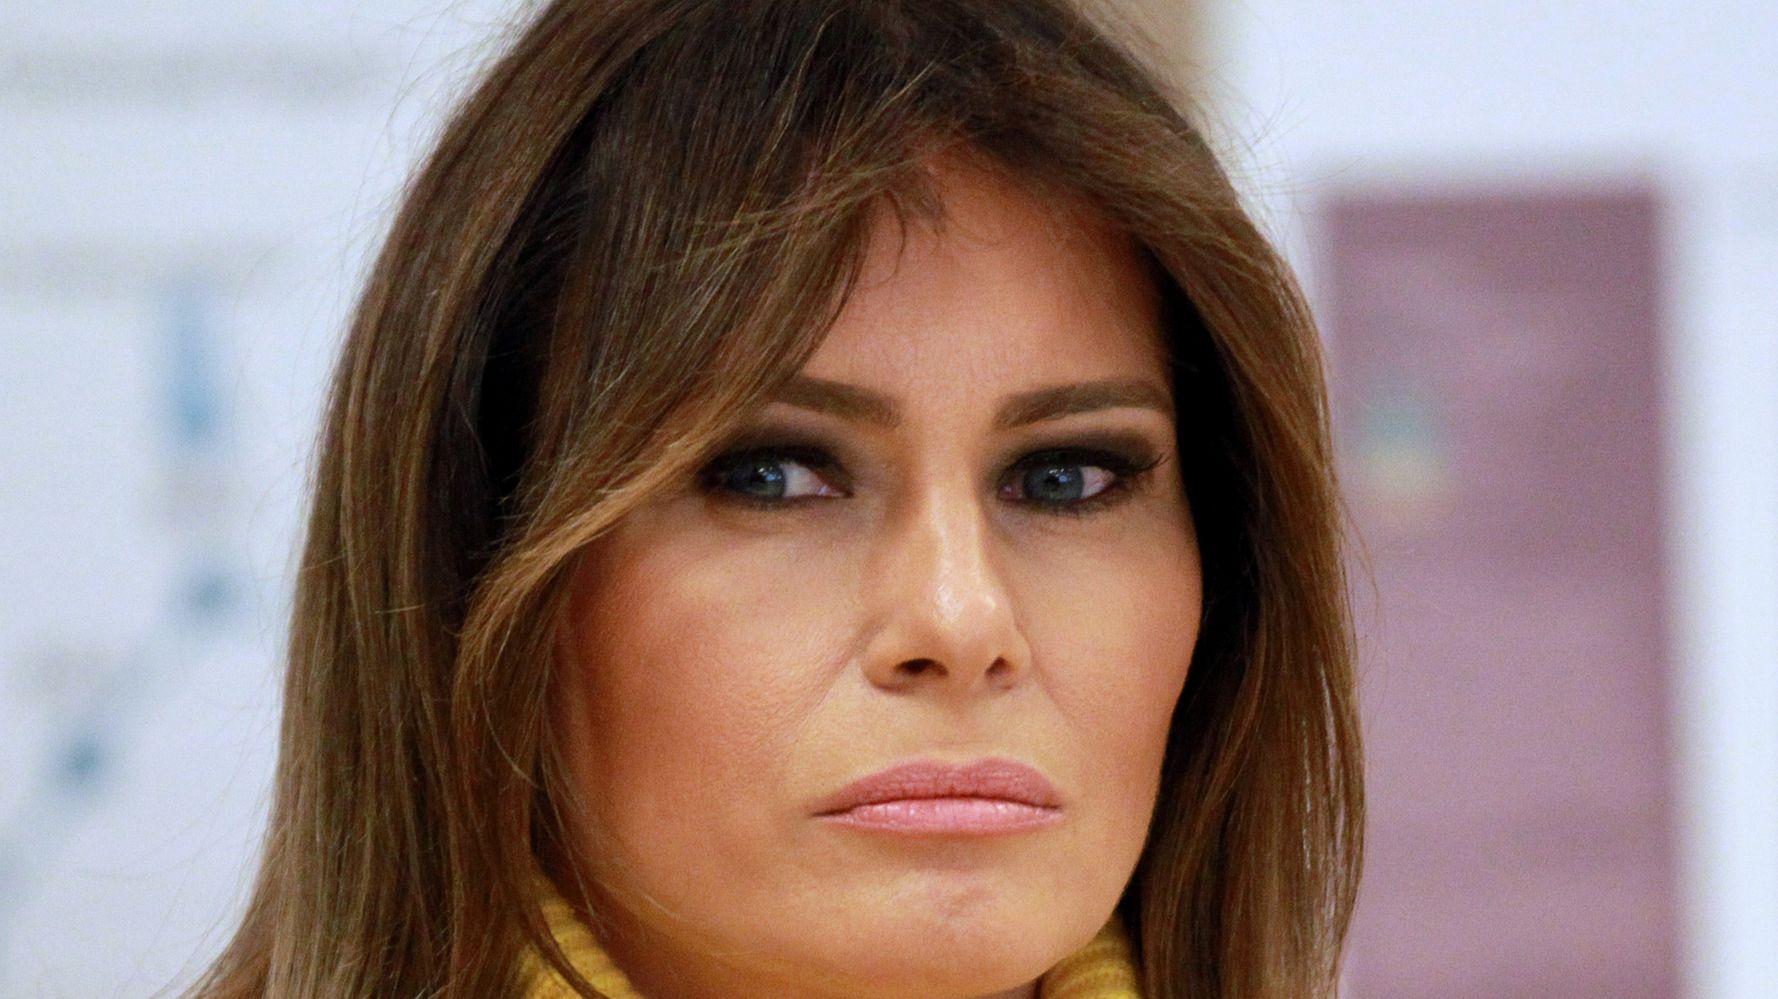 Parkland Survivor To Melania Trump: Stop Donald Trump Jr. From Cyberbullying Me